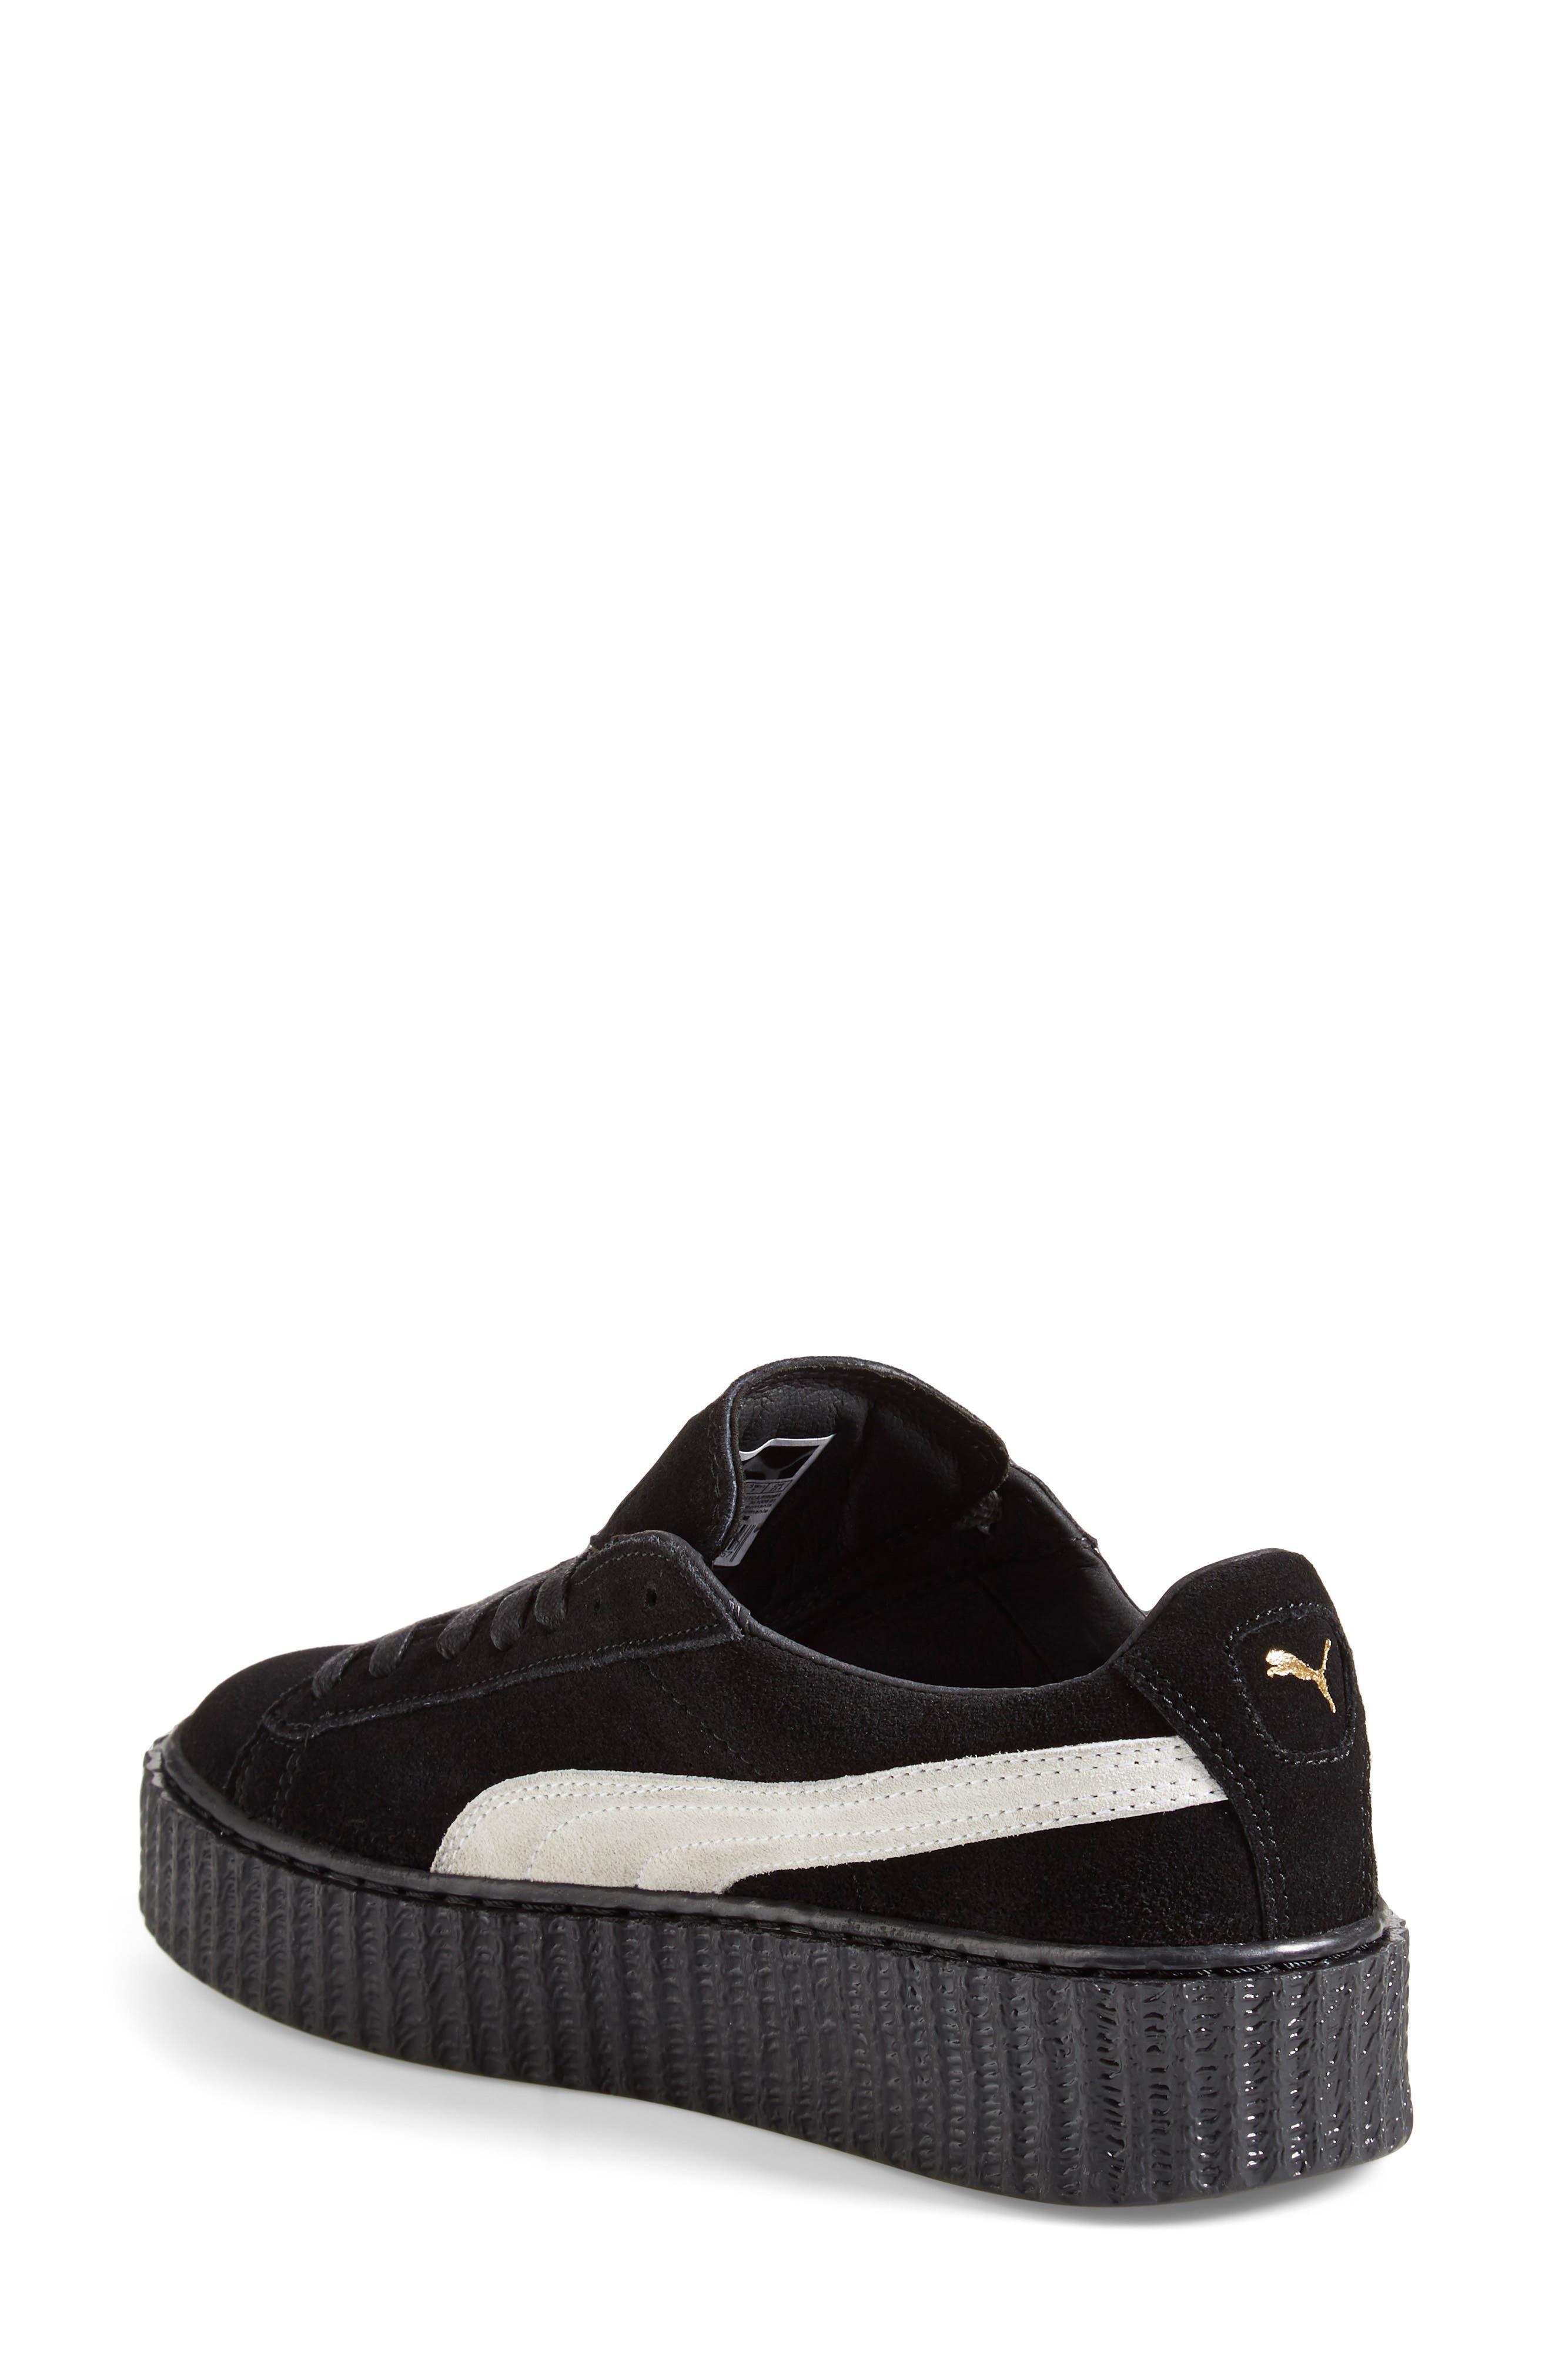 FENTY PUMA by Rihanna Creeper Sneaker,                             Alternate thumbnail 31, color,